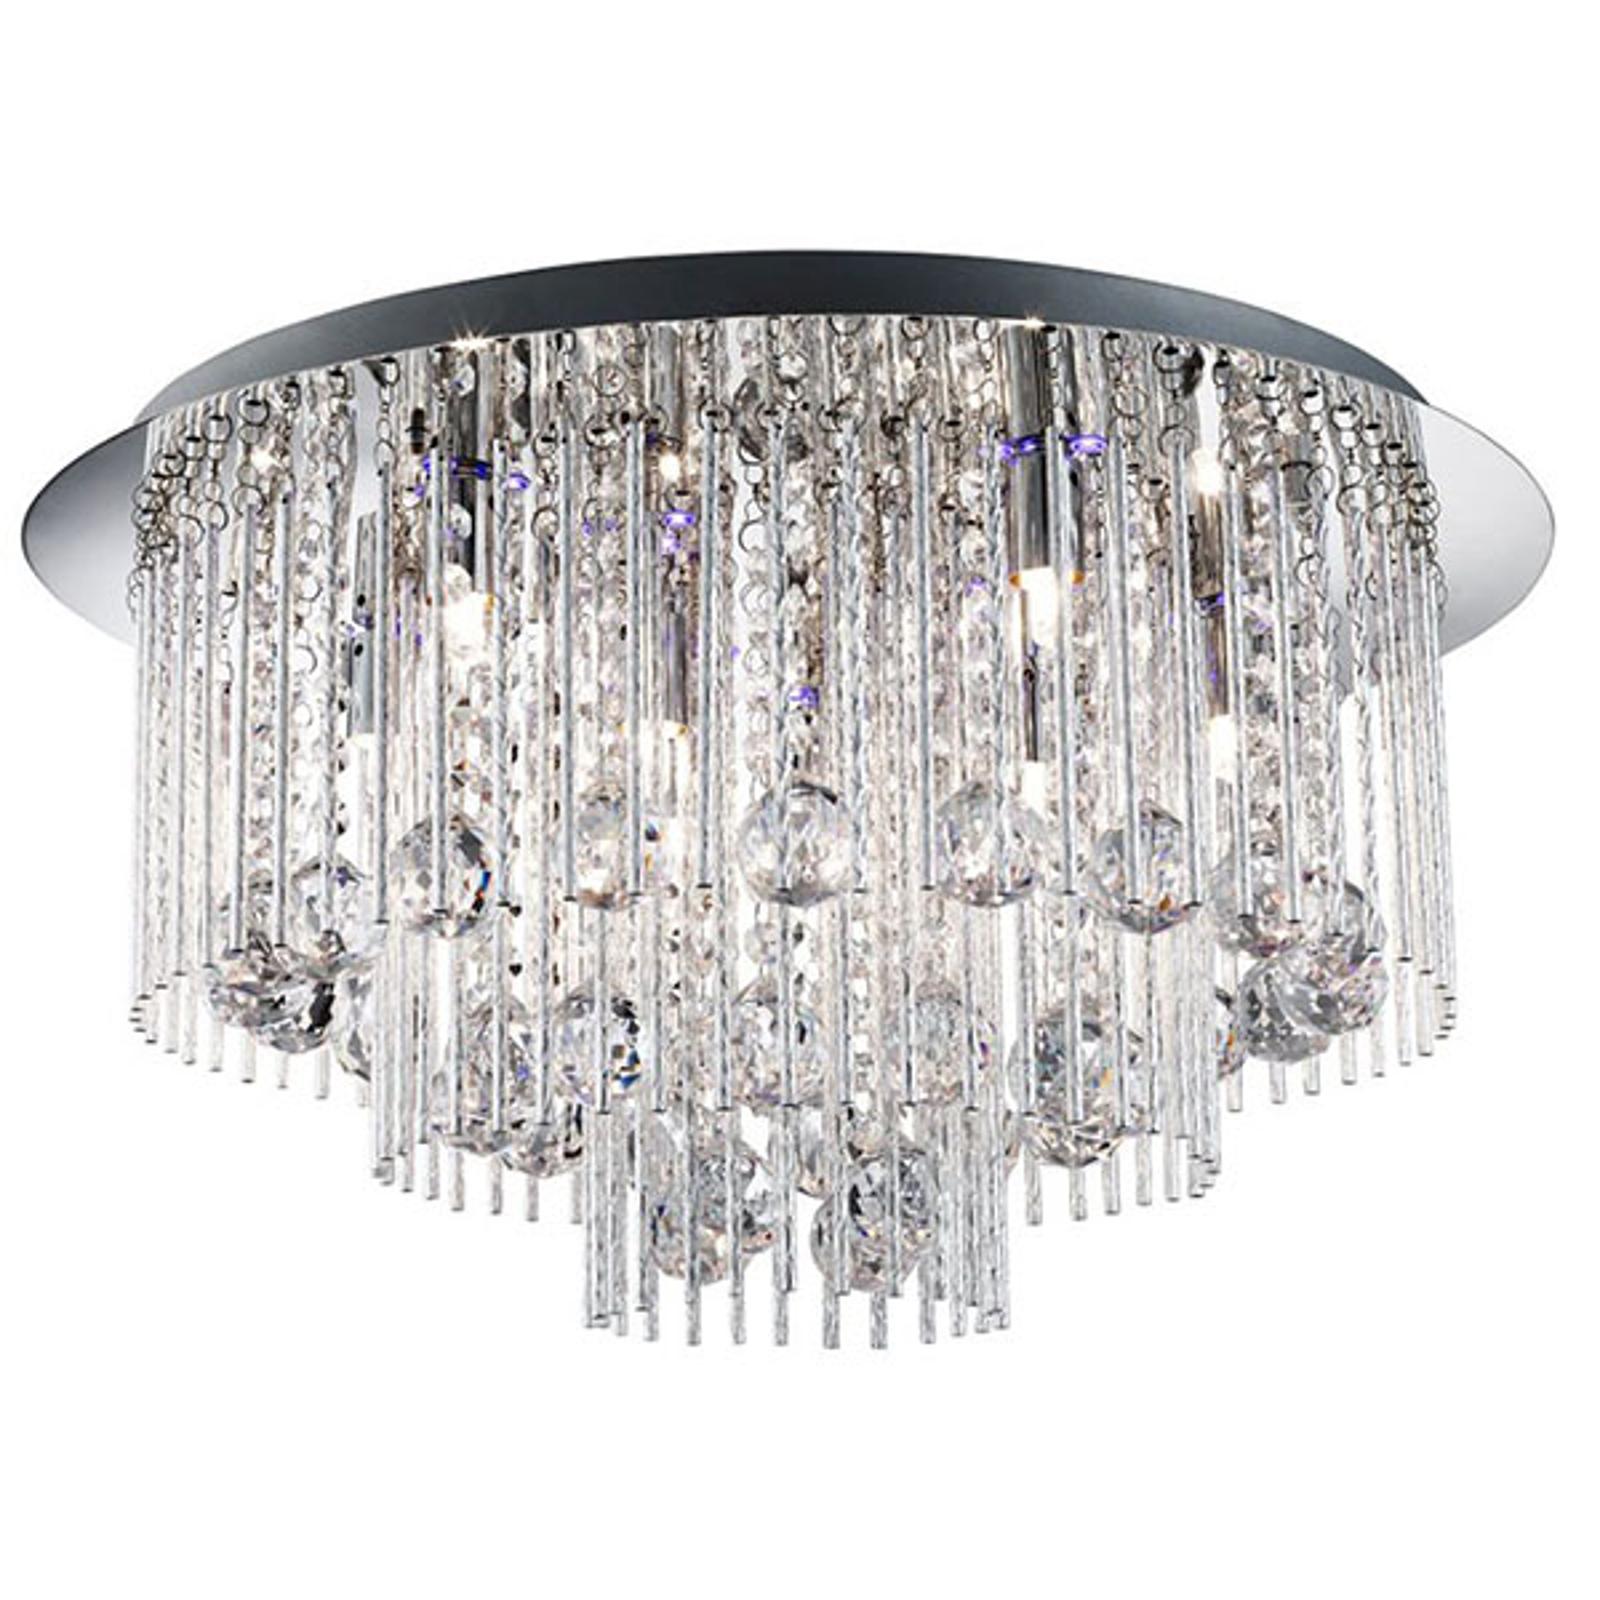 Plafondlamp Beatrix kristal met afstandsbediening